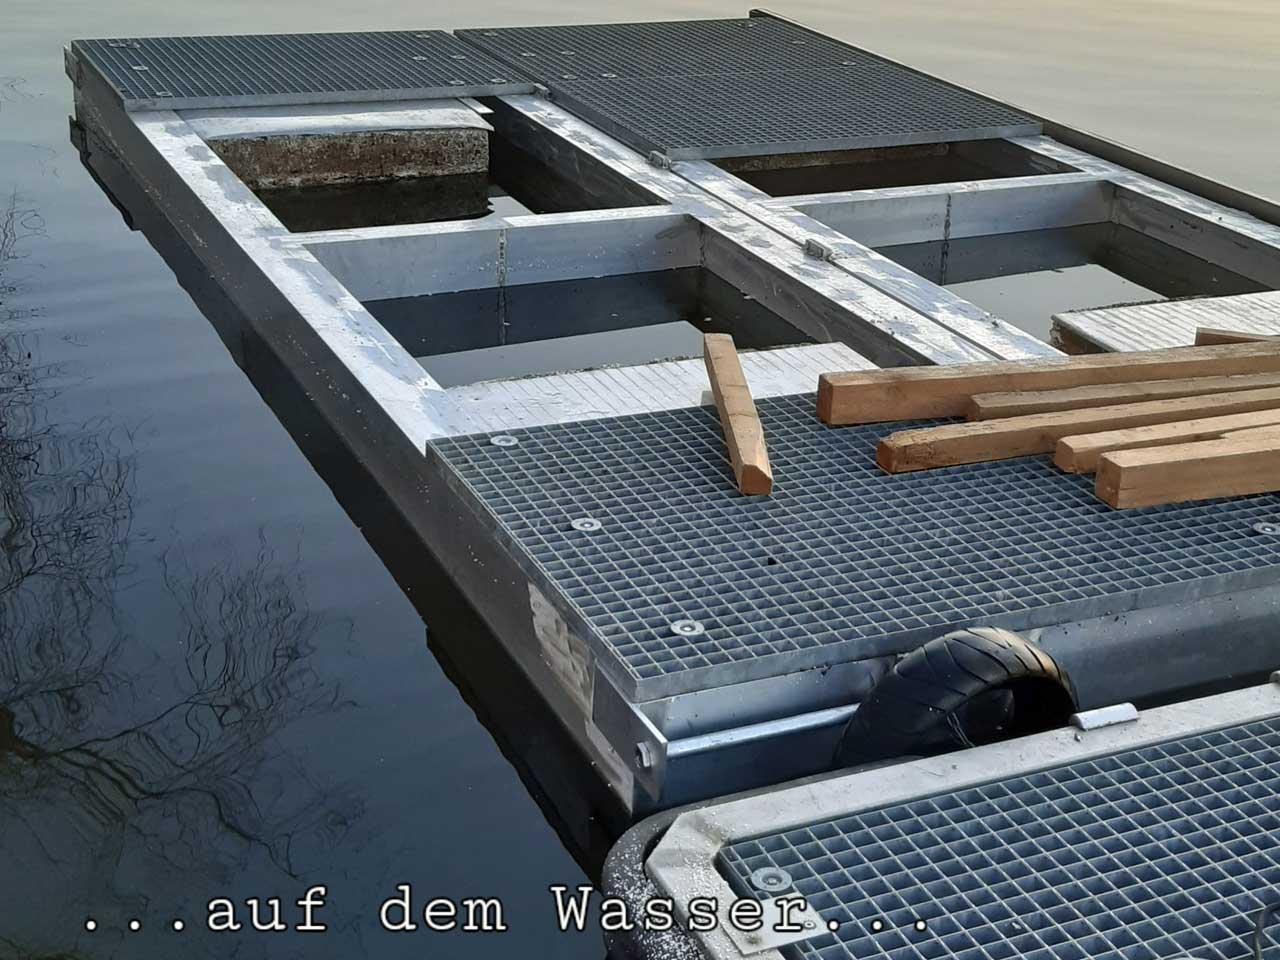 Bootpritsche aus Aluminiumprofil belegt mit Gitterrosten